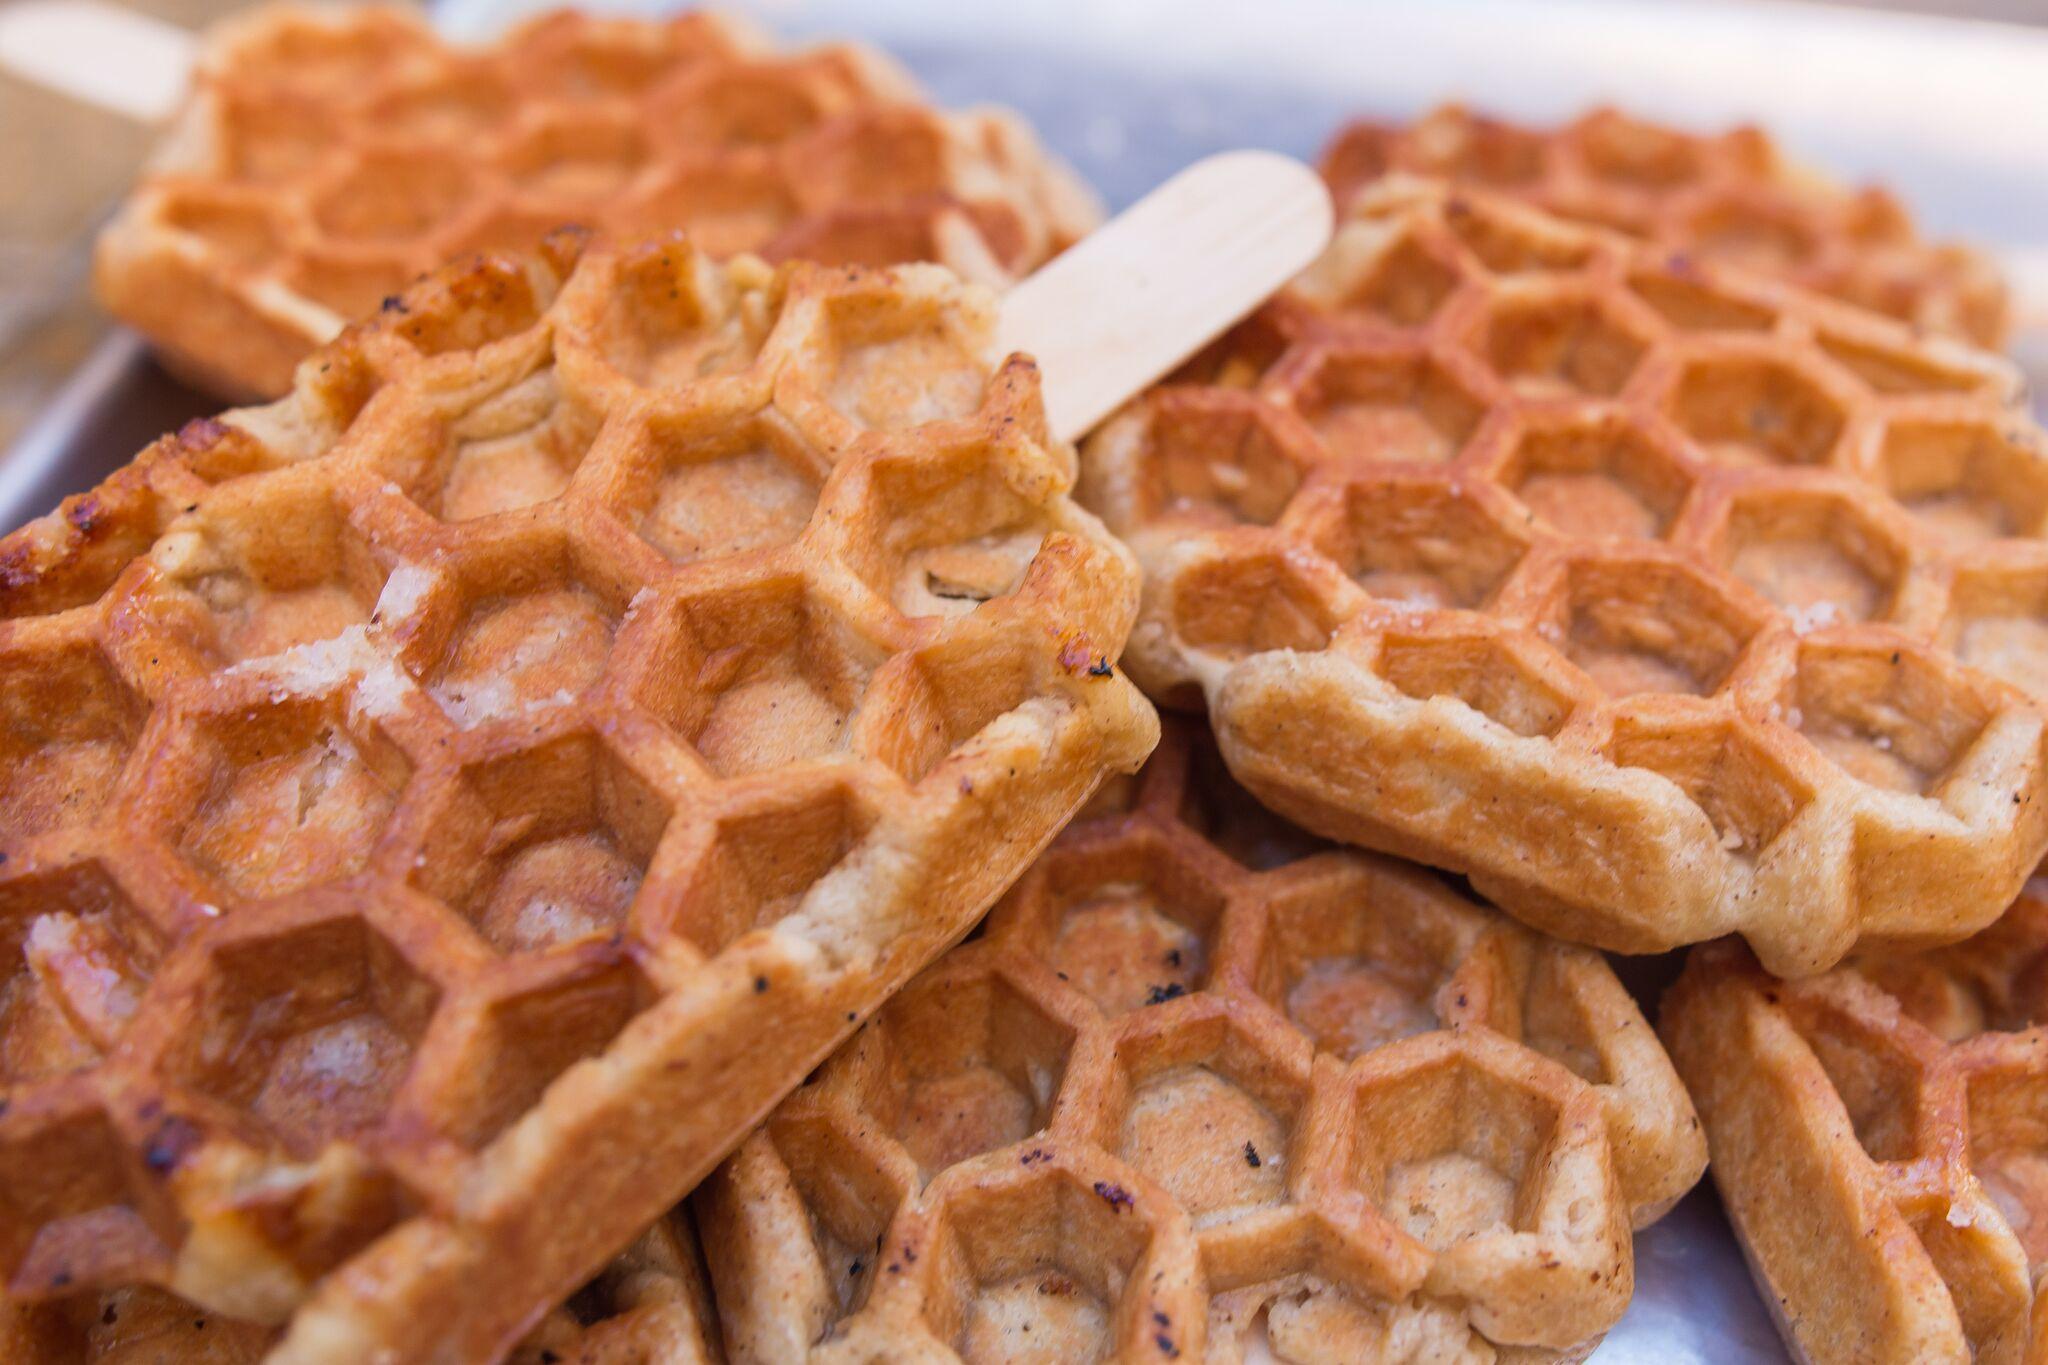 Fresh Belgium Liege waffles | photo courtesy of Sweet COMBforts